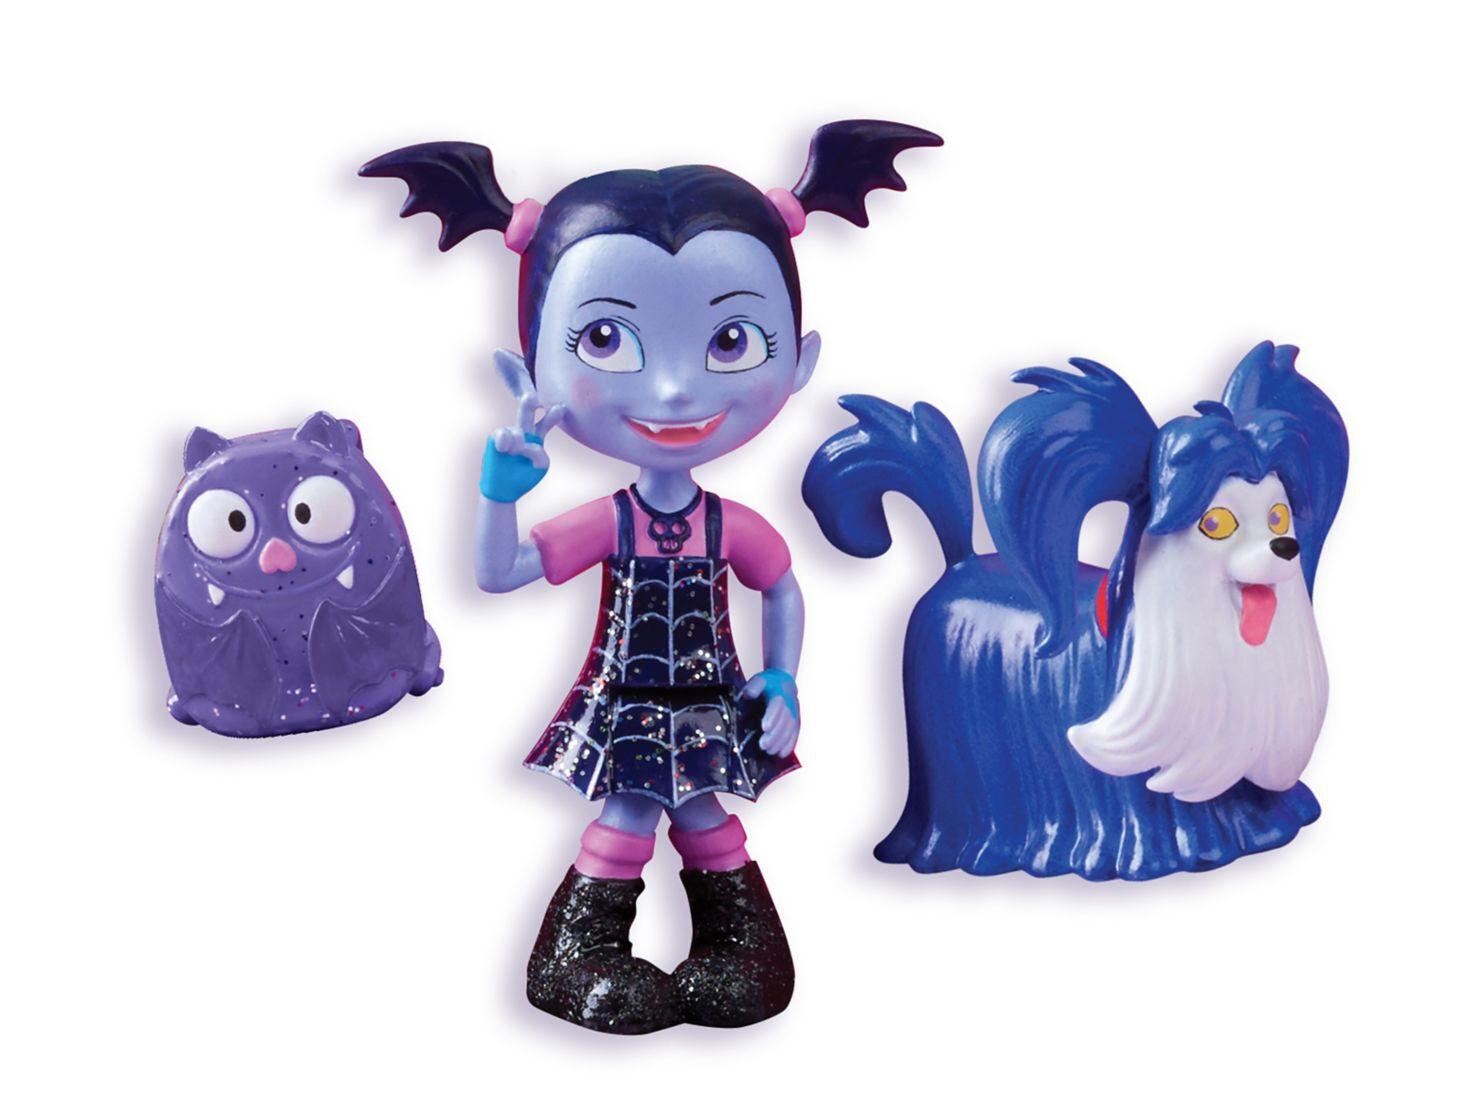 Disney Para Cesto Ropa Muebles Juguetes Plegable Vampirina ALcq3R4j5